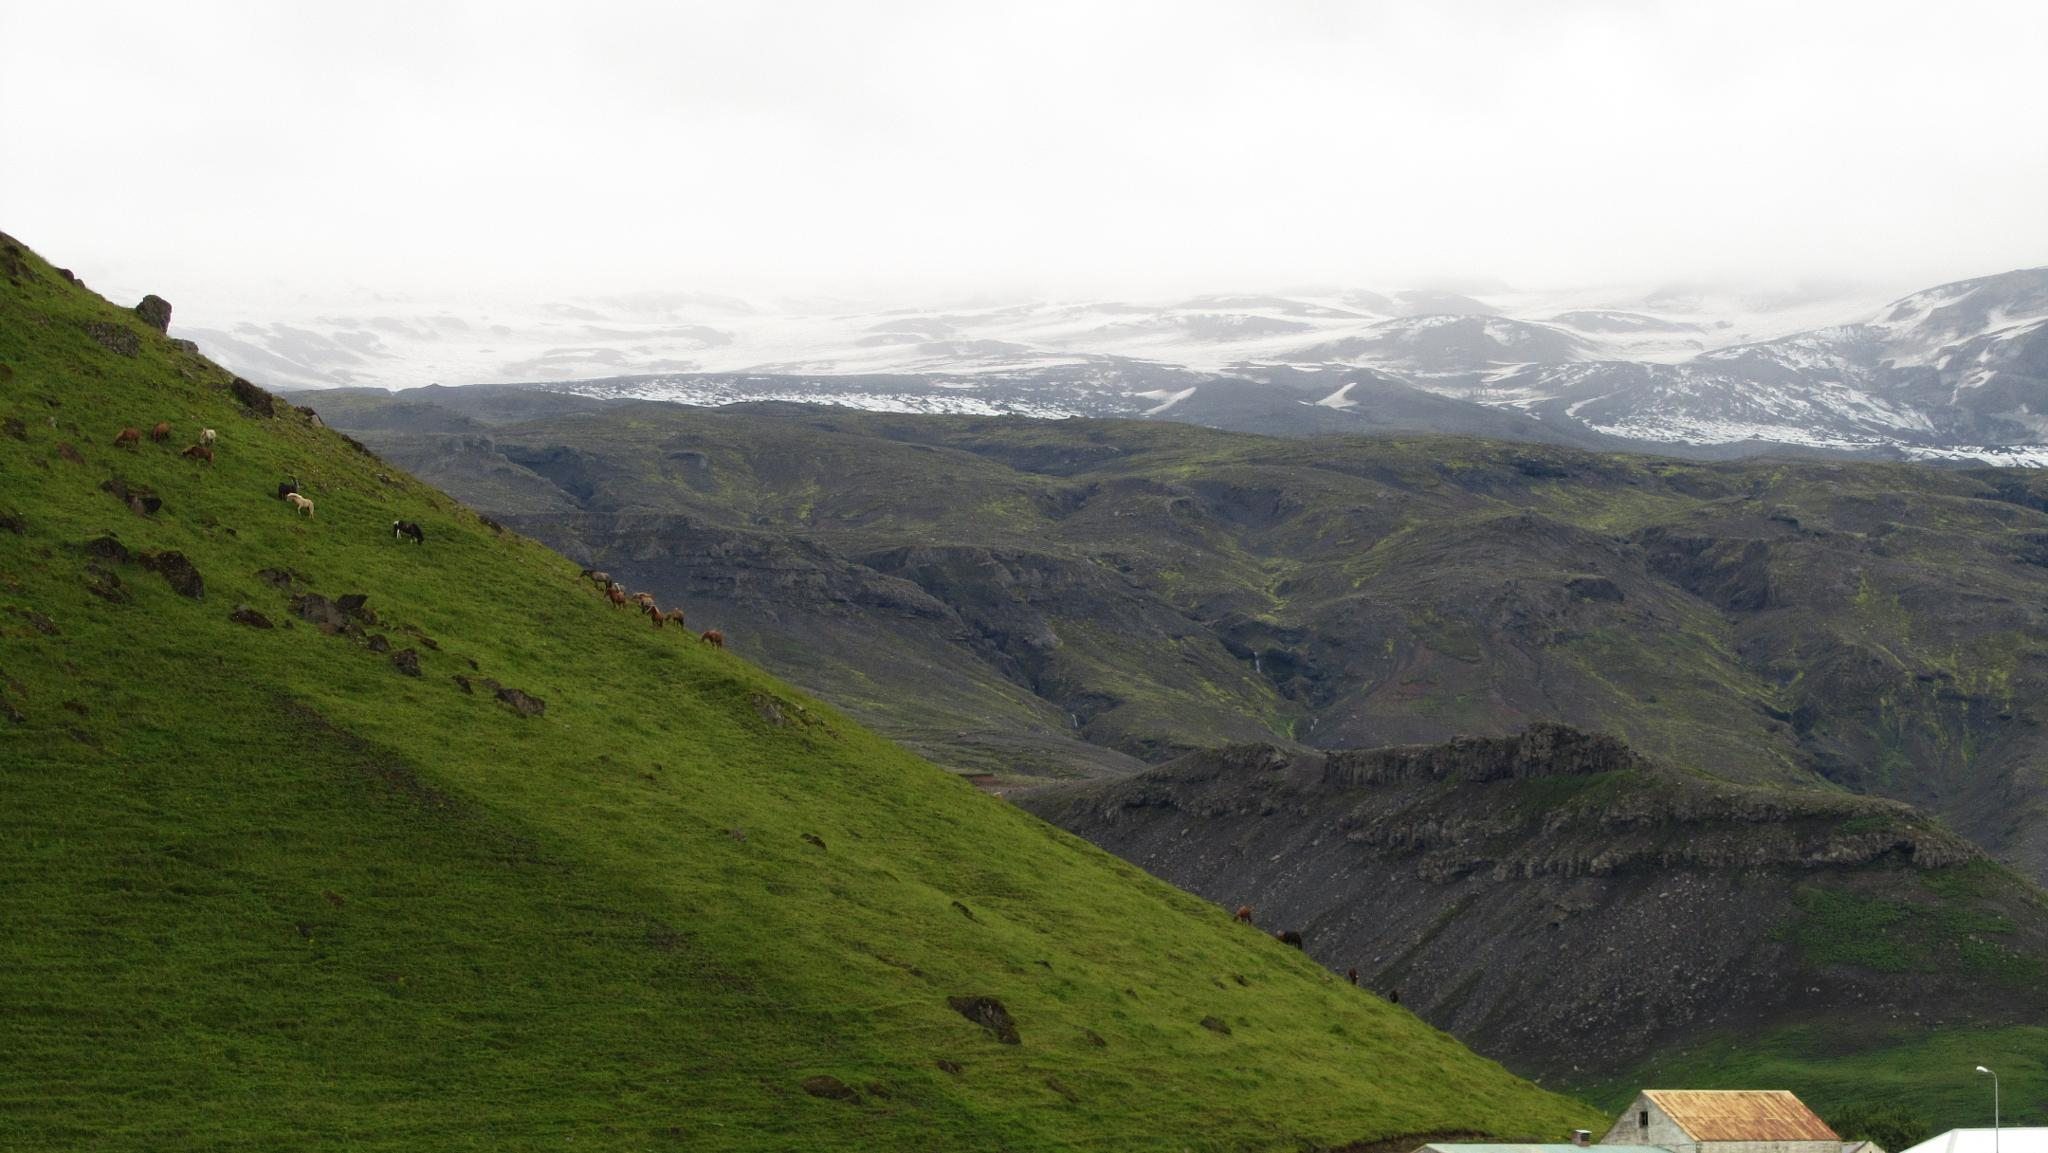 Eyjafjallajökull by ingamay.premros